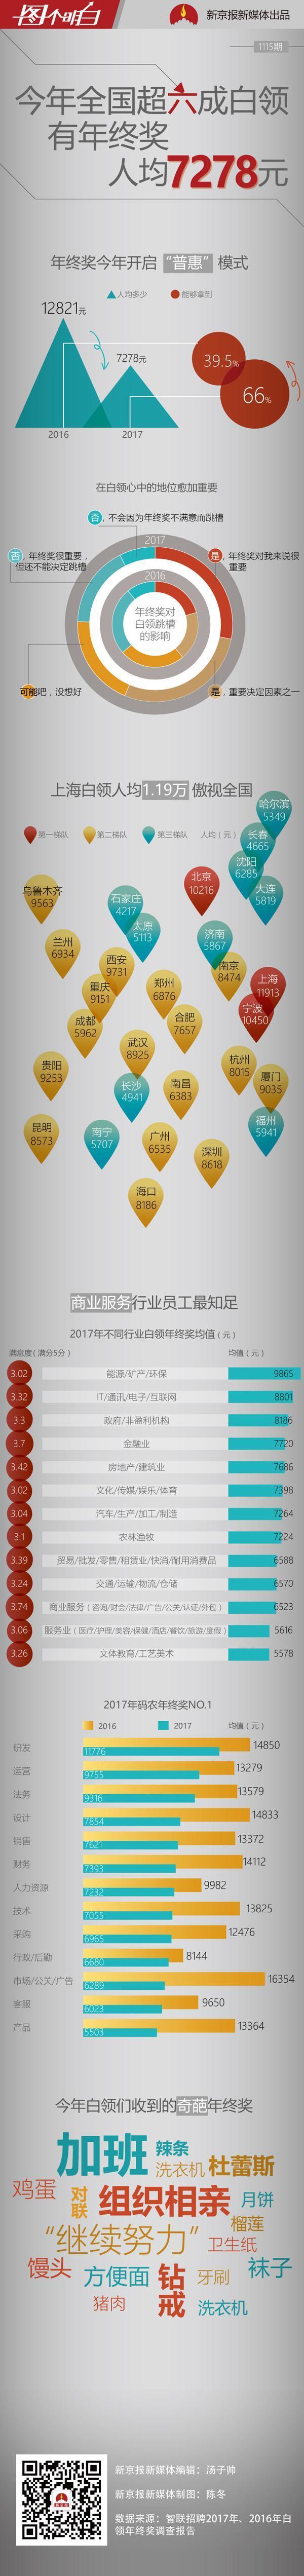 mg电子游戏网站网址:2017全国白领年终奖人均7278元 但不是钱越多越满意